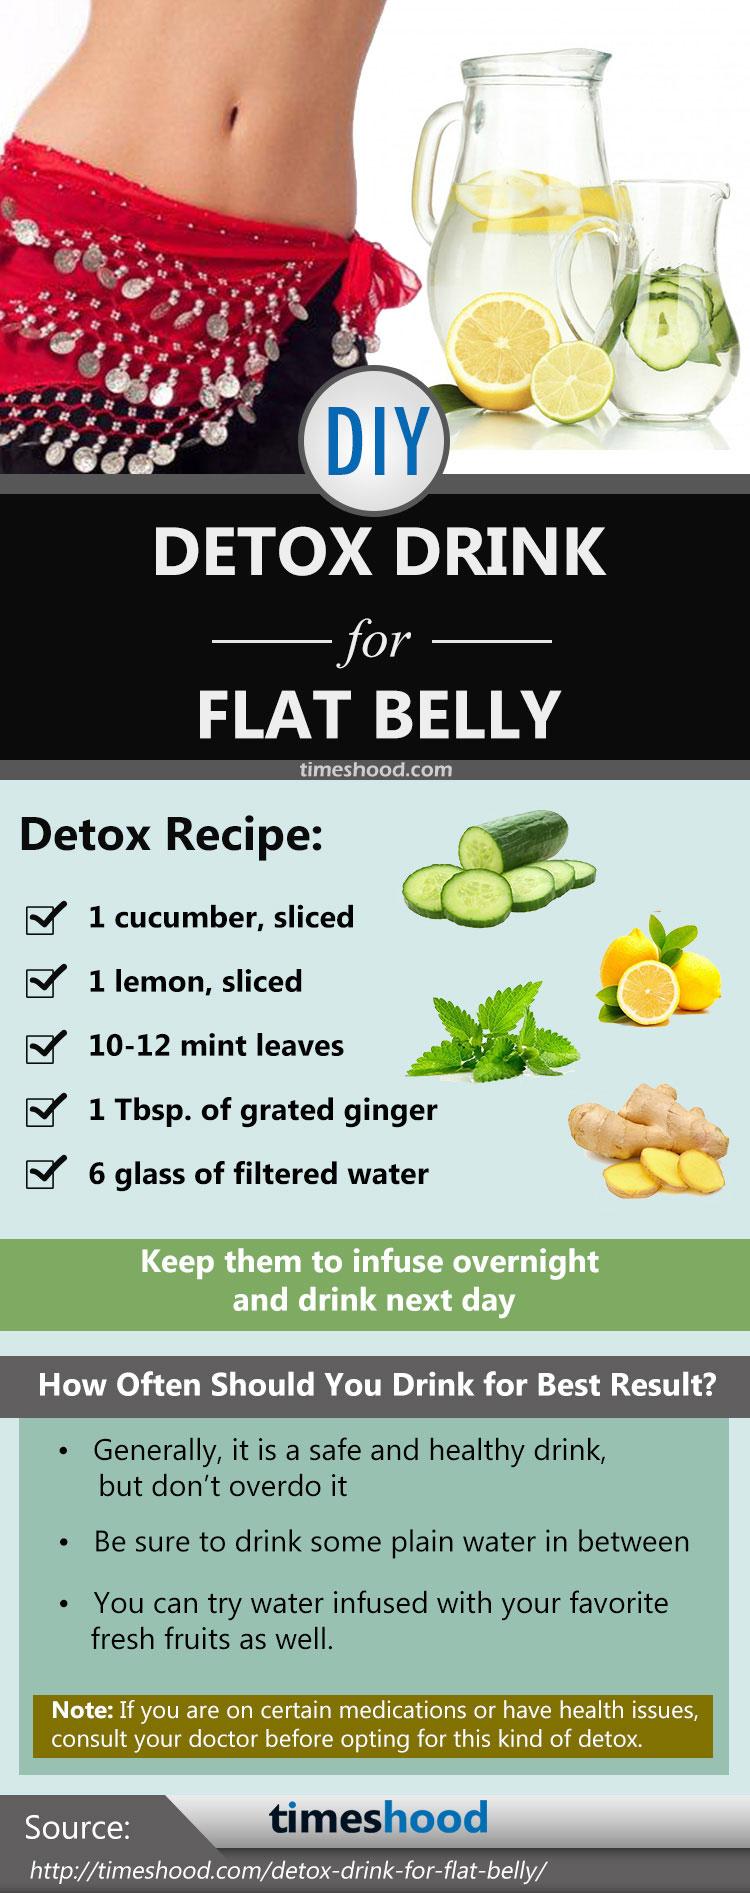 5 Ingredients that Boost Flavor